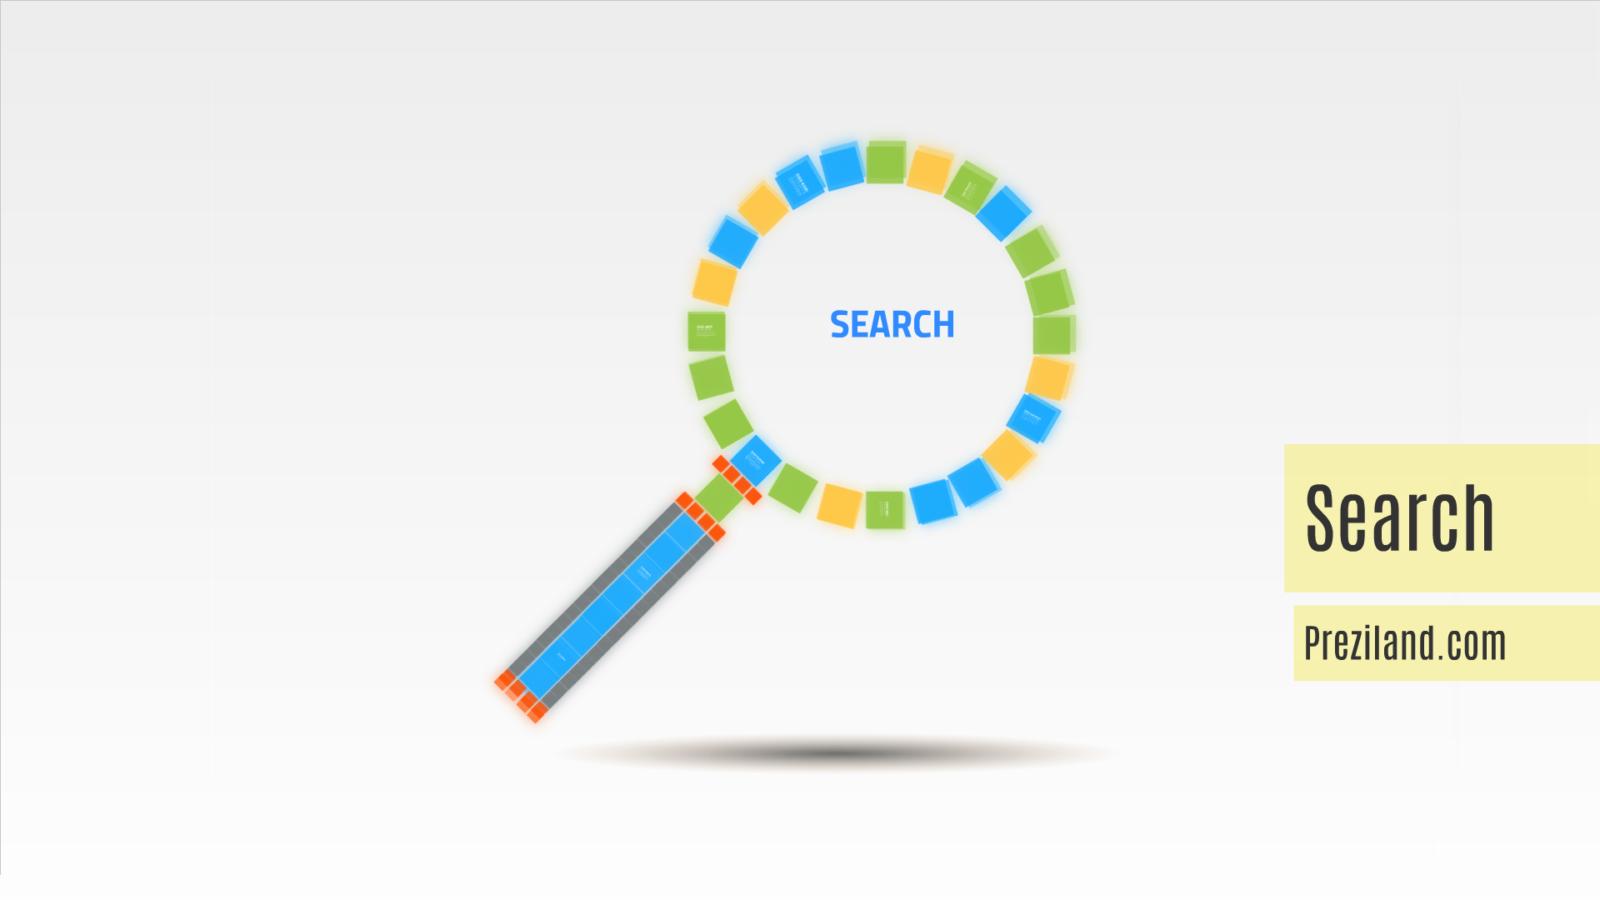 search Prezi template